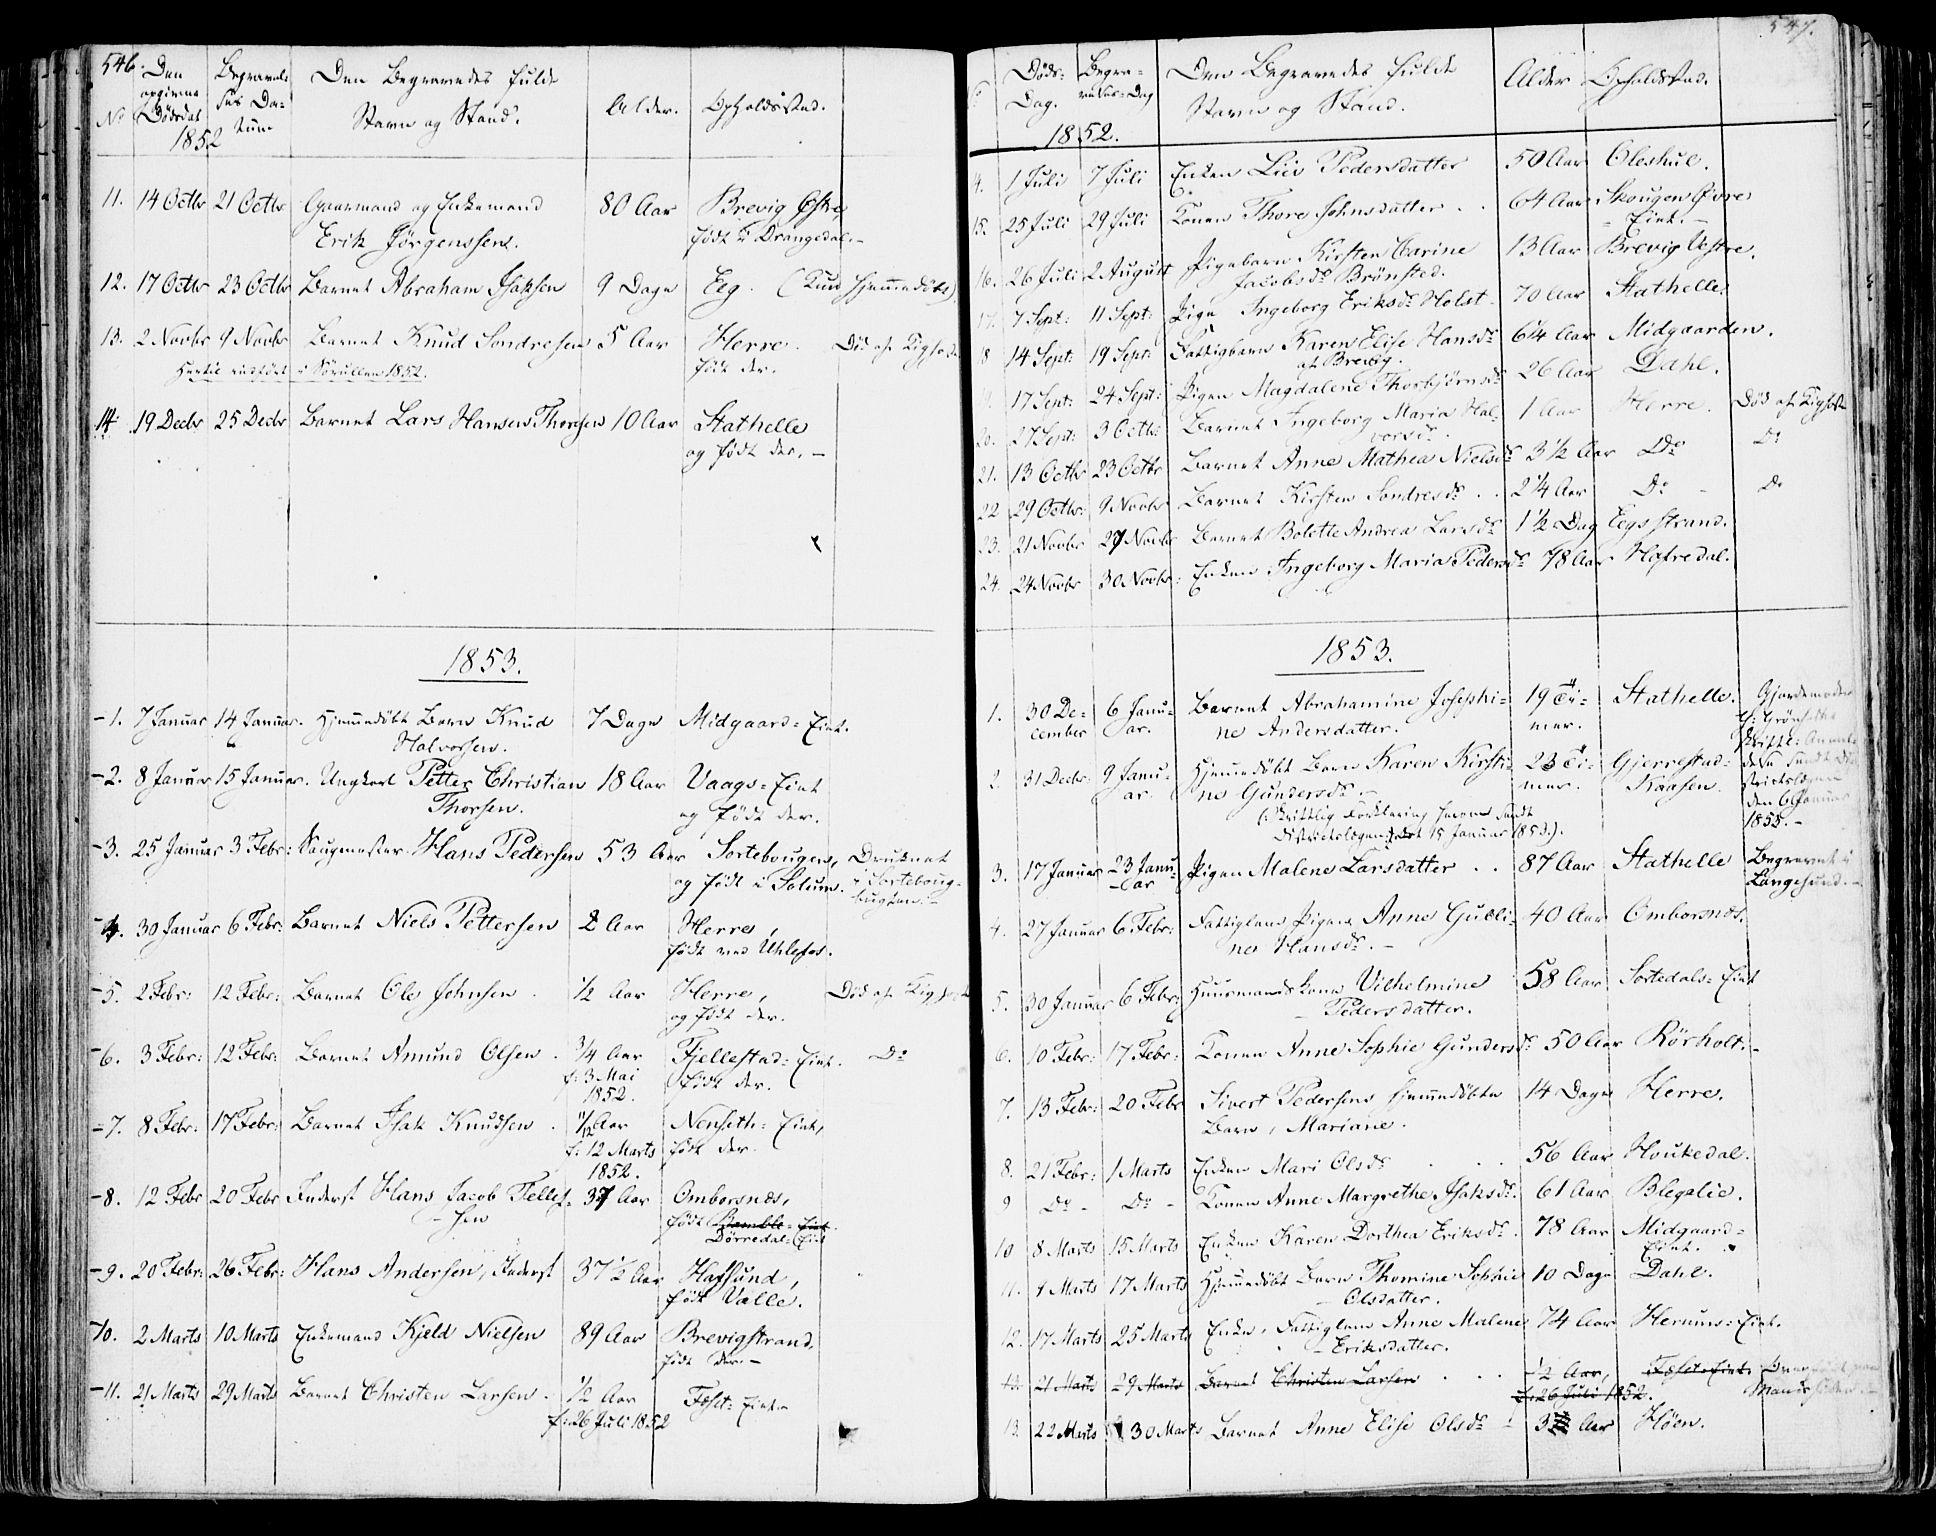 SAKO, Bamble kirkebøker, F/Fa/L0004: Ministerialbok nr. I 4, 1834-1853, s. 546-547